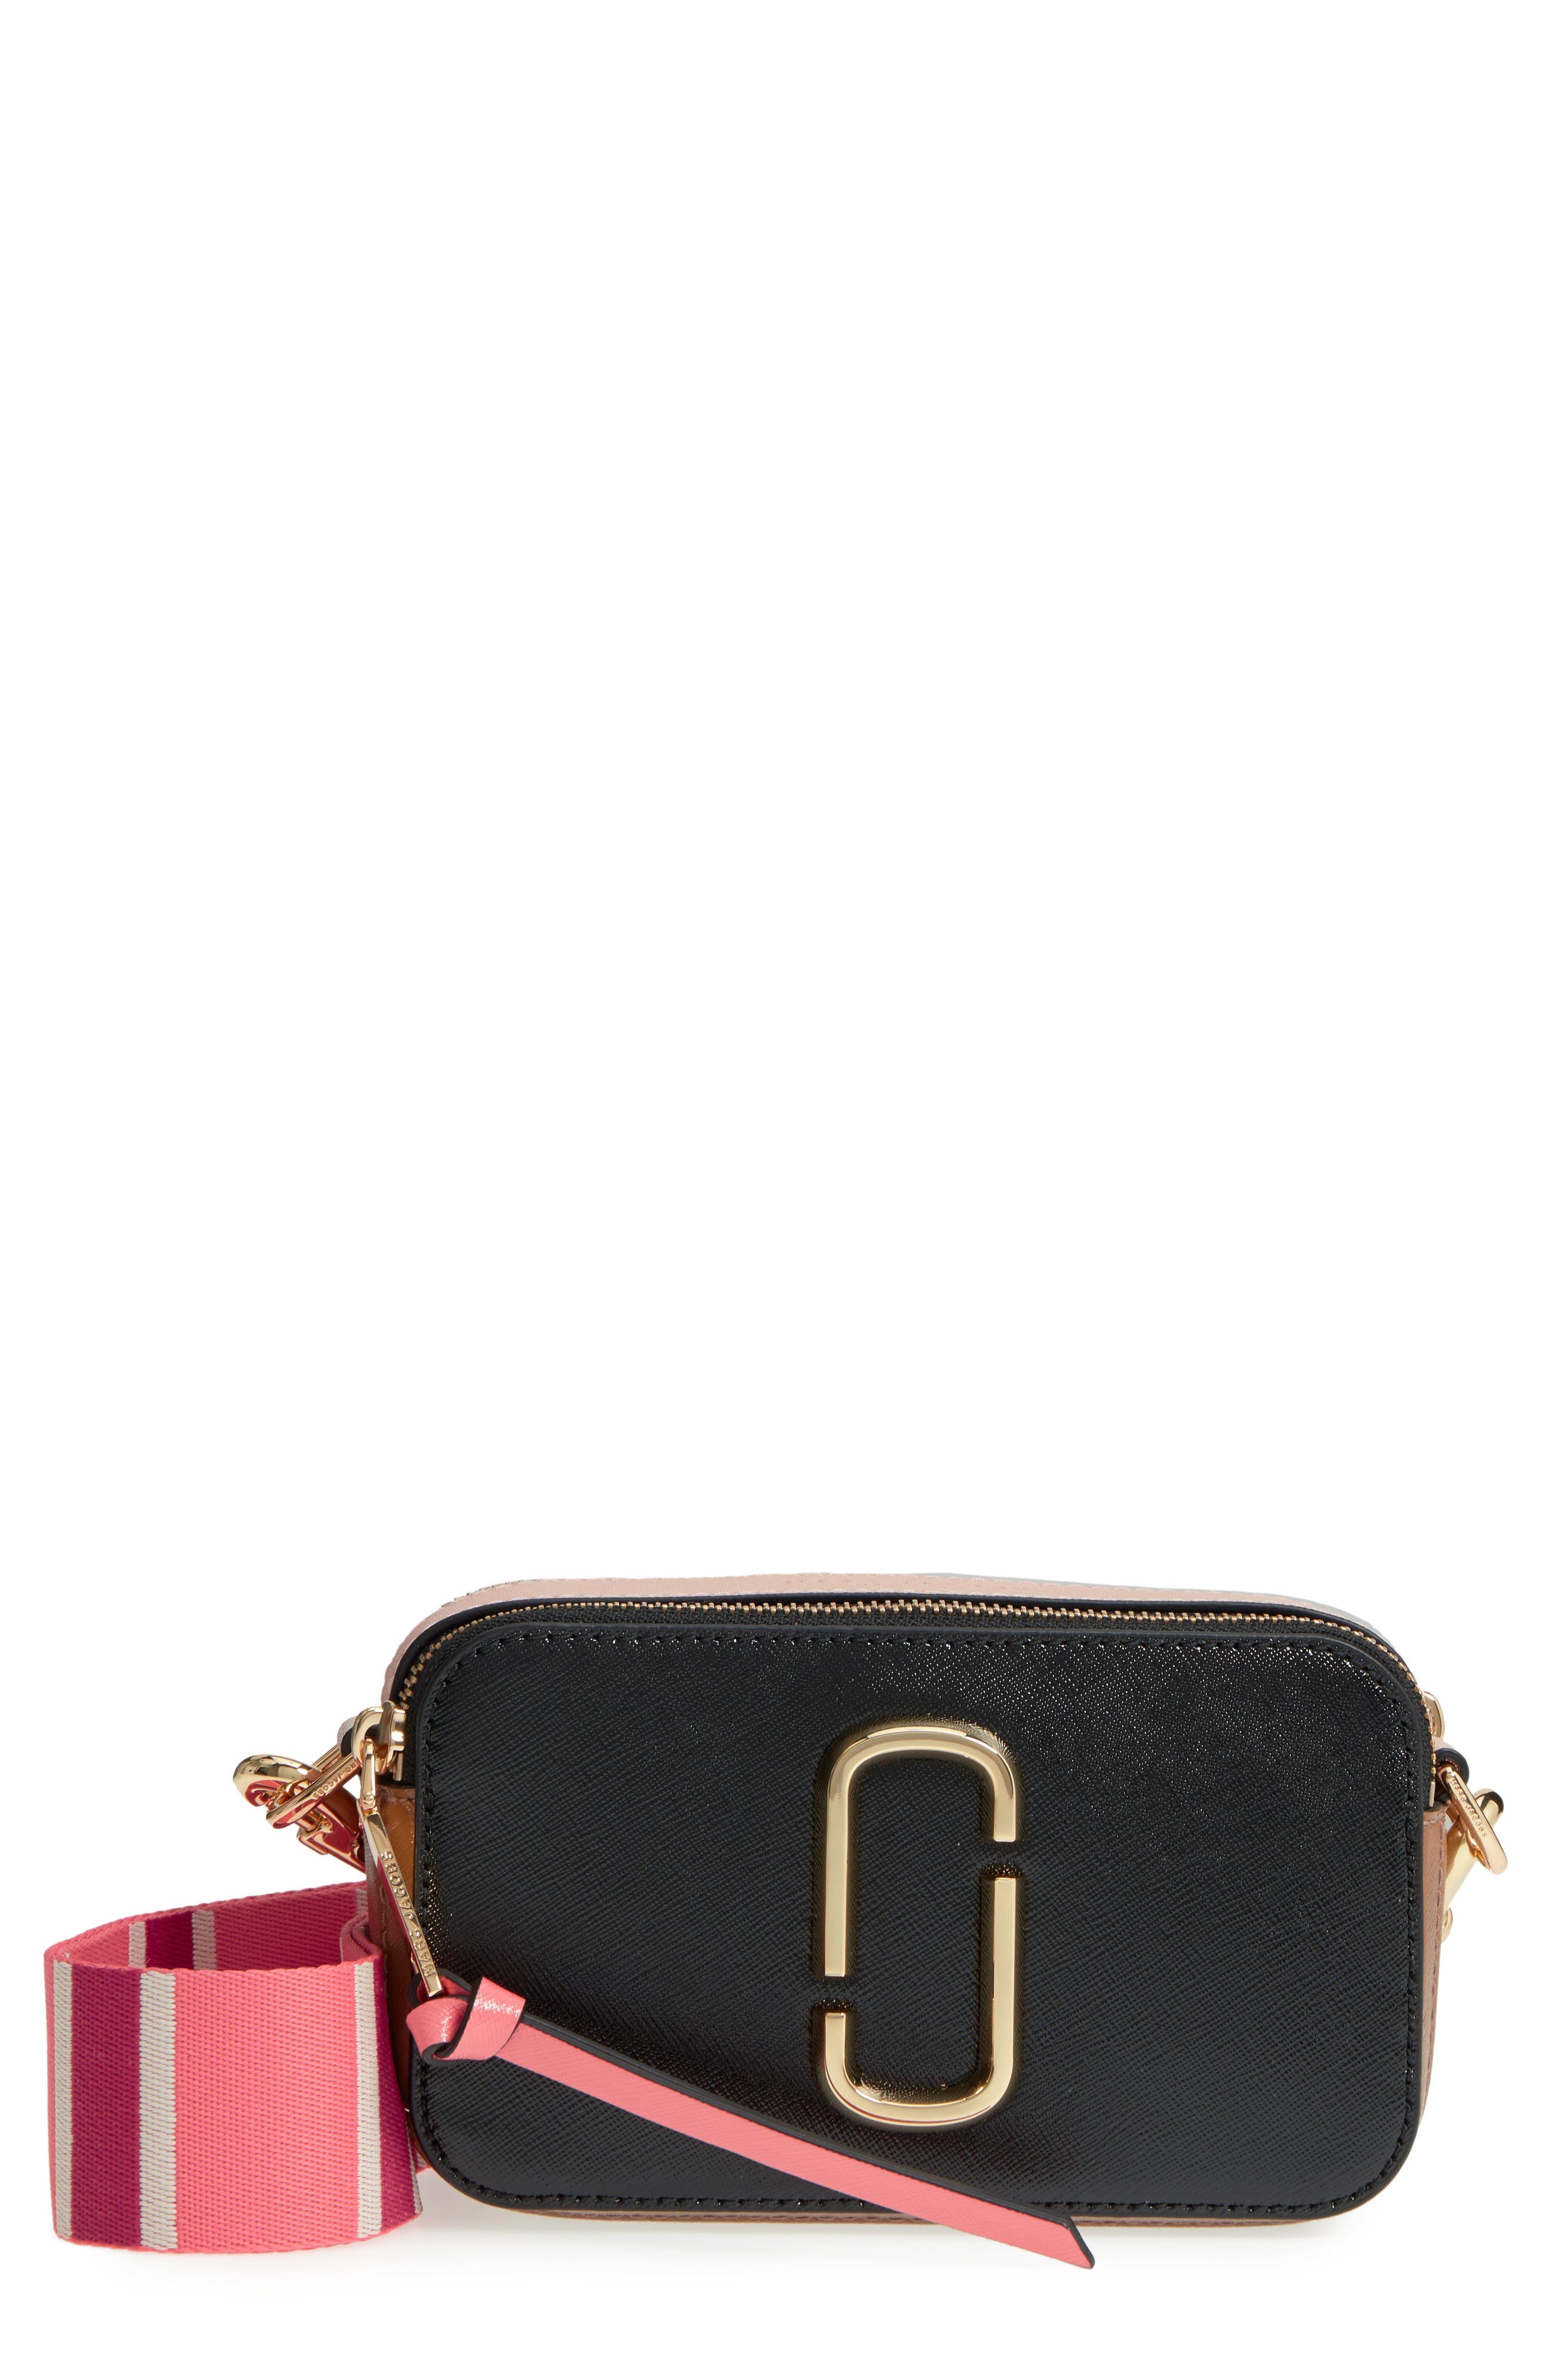 Main Image - MARC JACOBS Snapshot Crossbody Bag